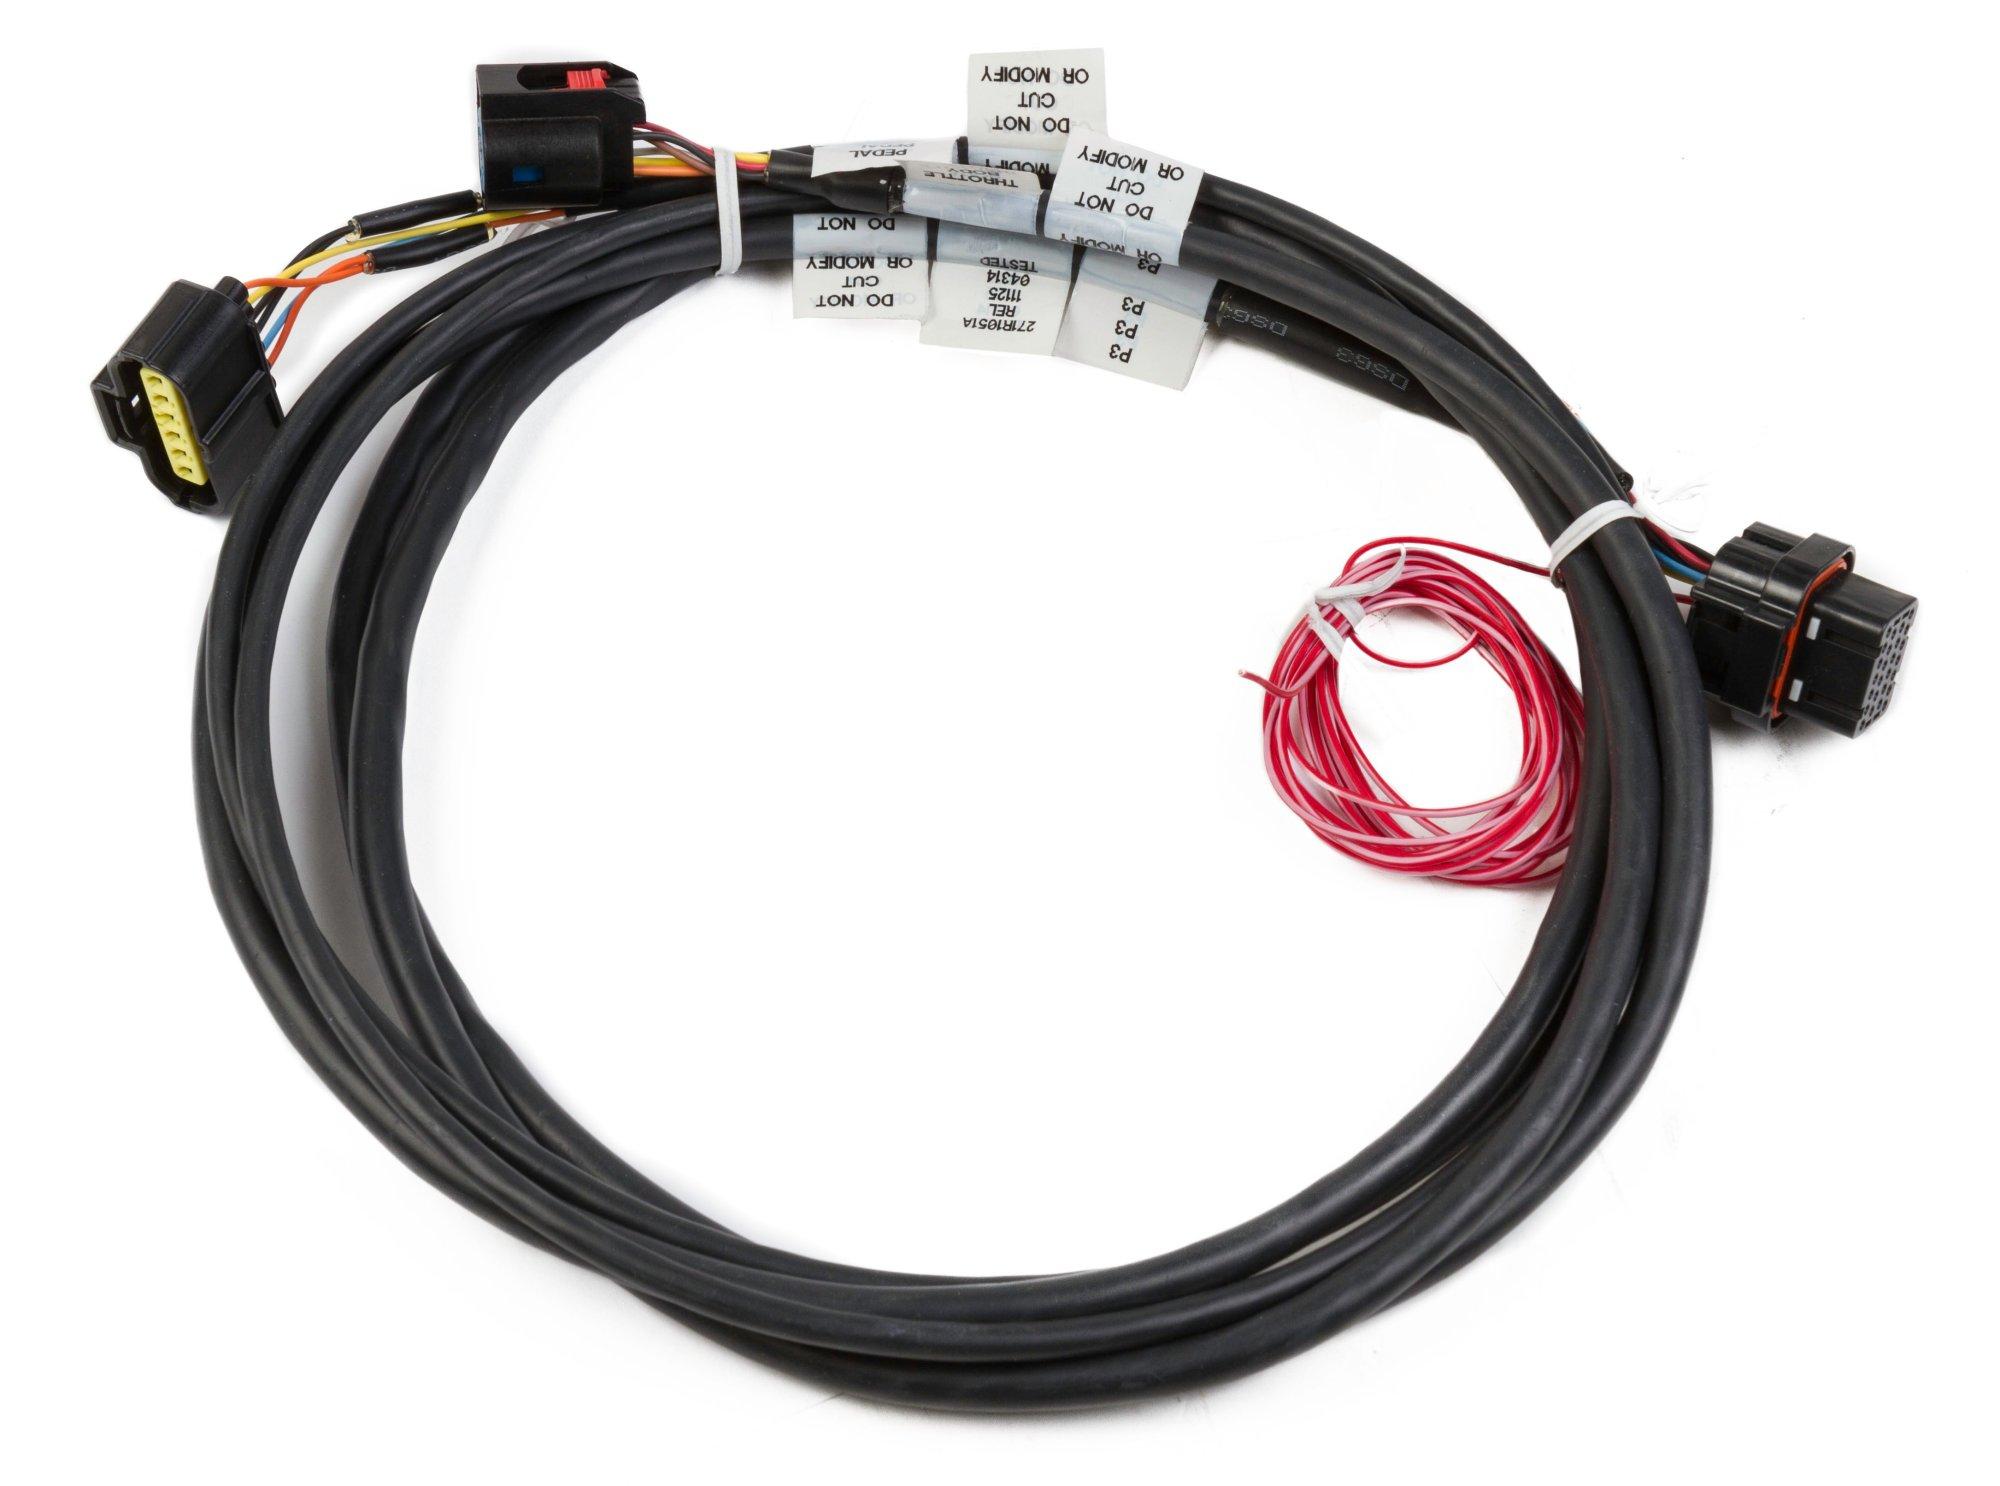 hight resolution of holley efi 558 417 gen iii hemi drive by wire harness early pedal 5 7 hemi swap wiring harness hemi wiring harness